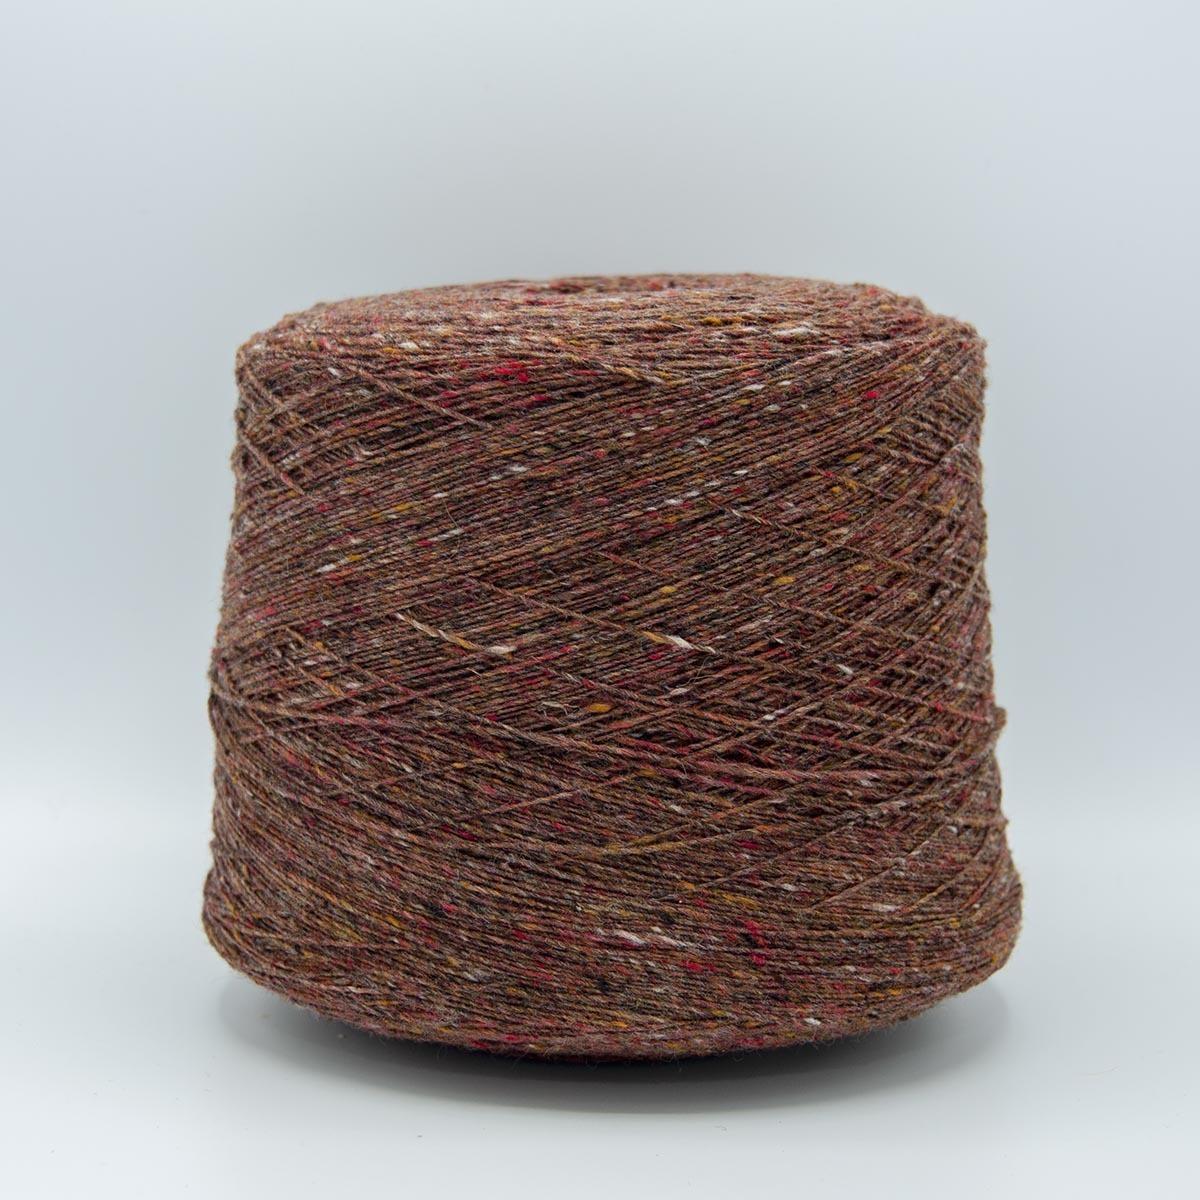 Knoll Yarns Soft Donegal (одинарный твид) - 5585